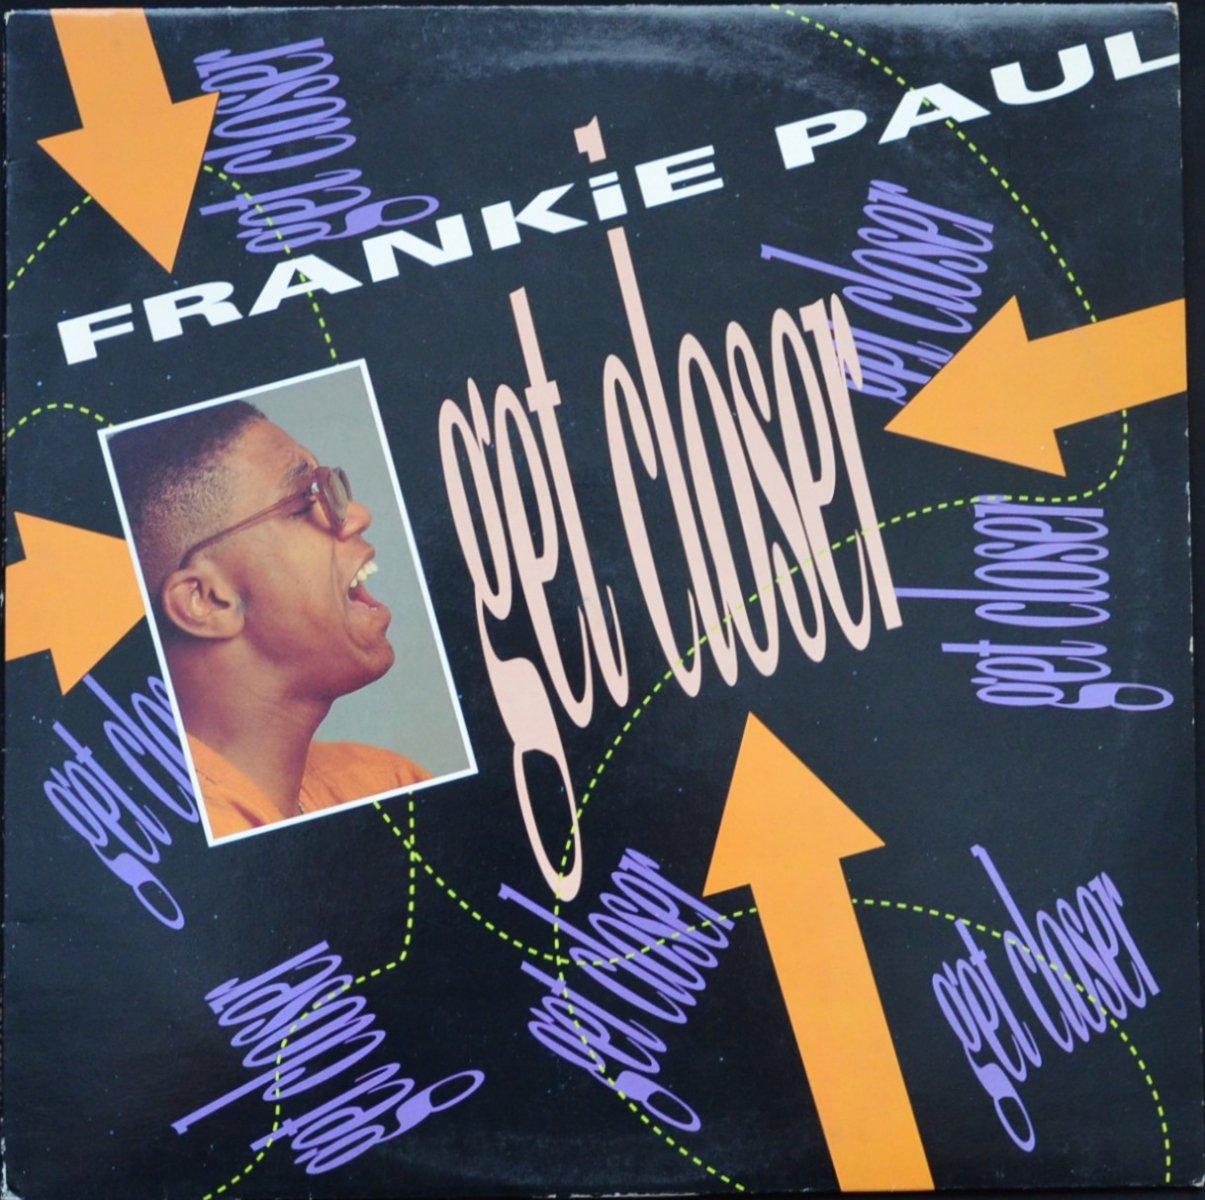 FRANKIE PAUL / GET CLOSER (1LP)